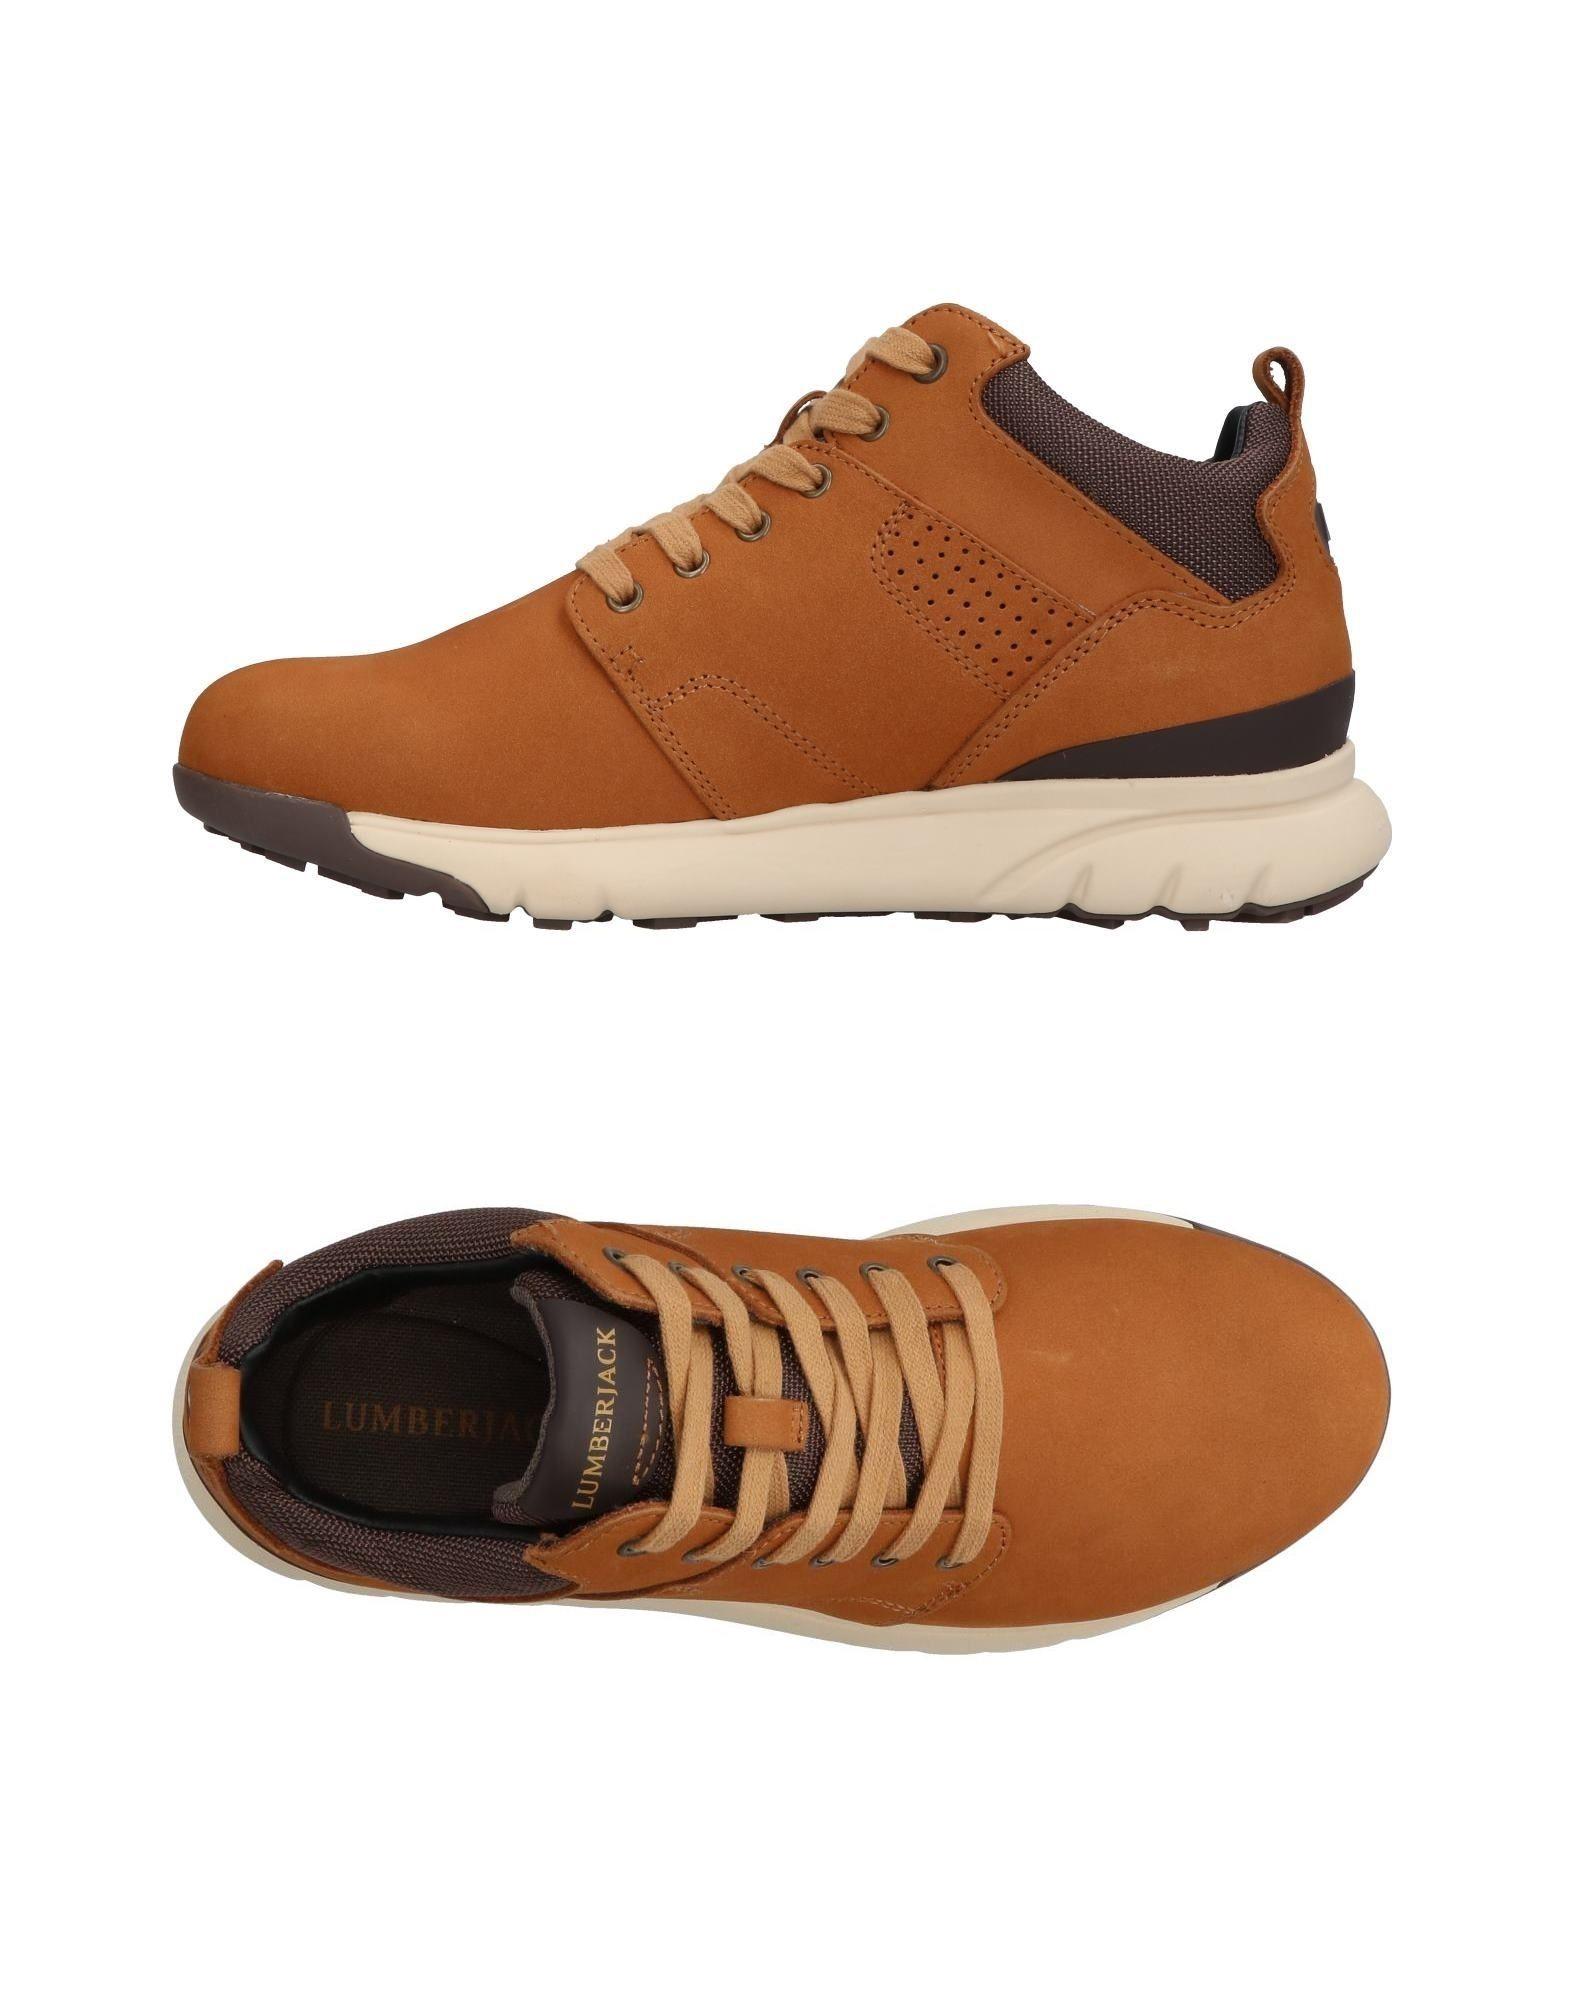 A buon mercato Sneakers Lumberjack Uomo - 11337363BH